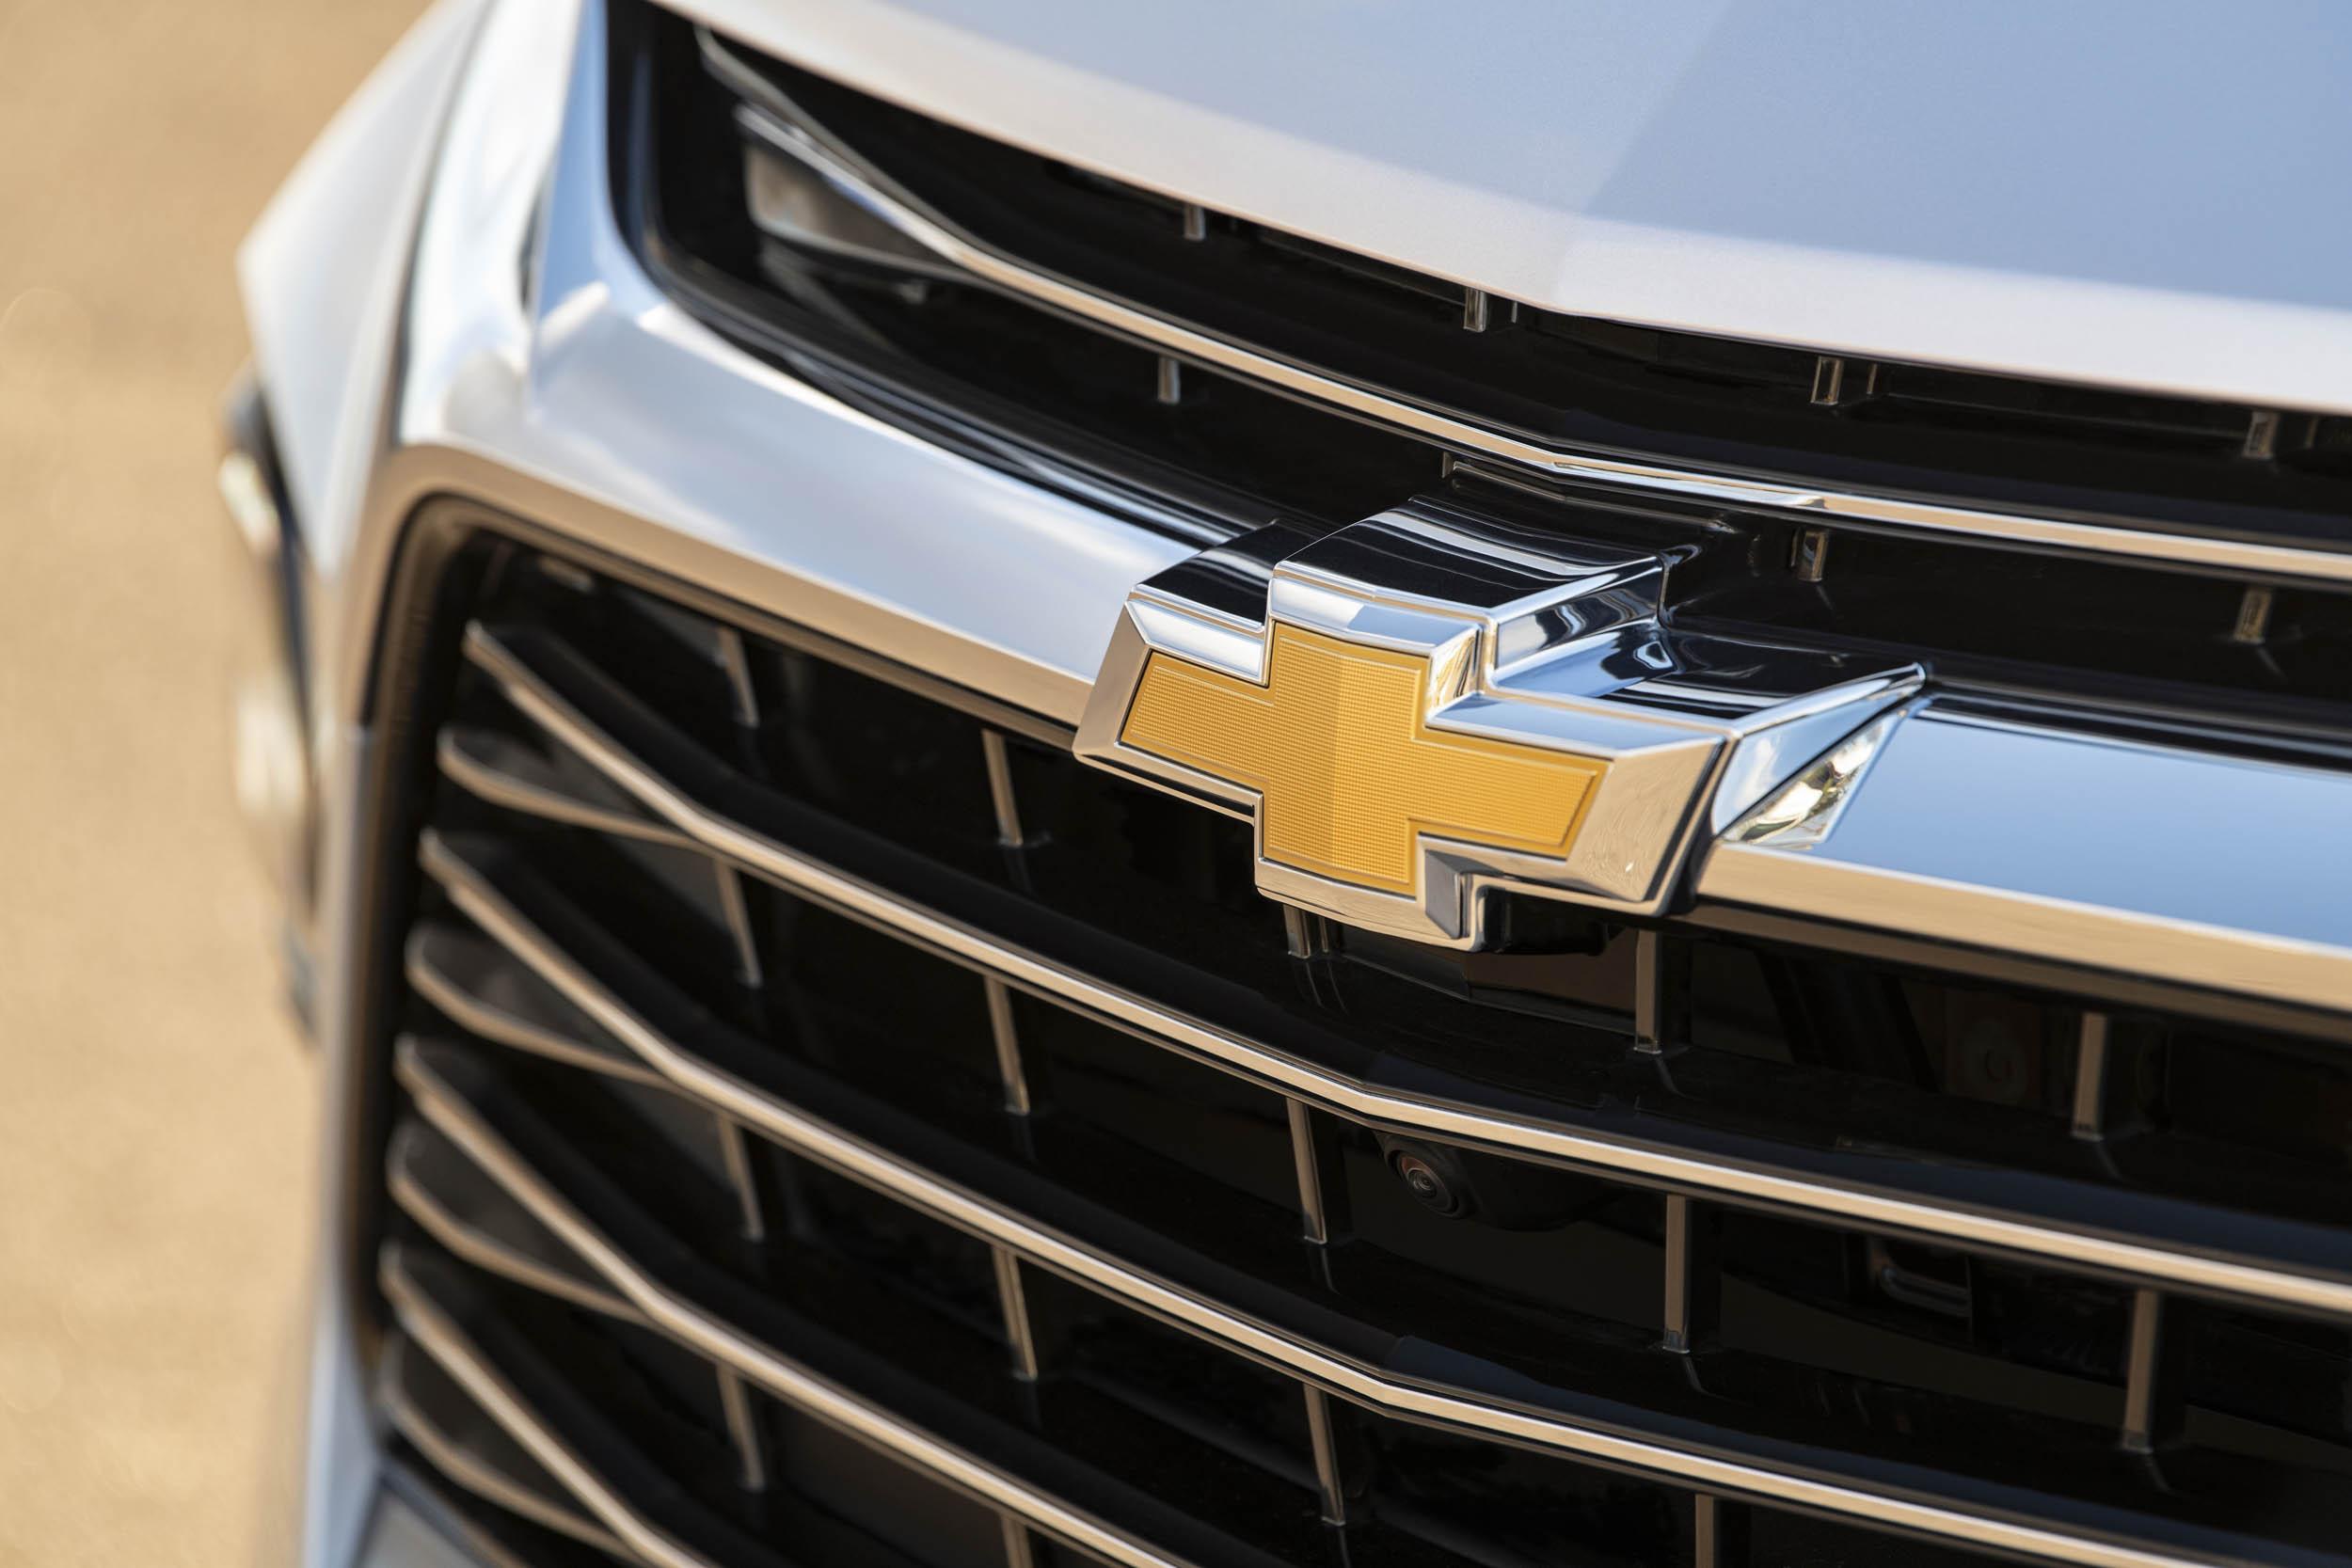 2019 Chevrolet Blazer grille badge detail